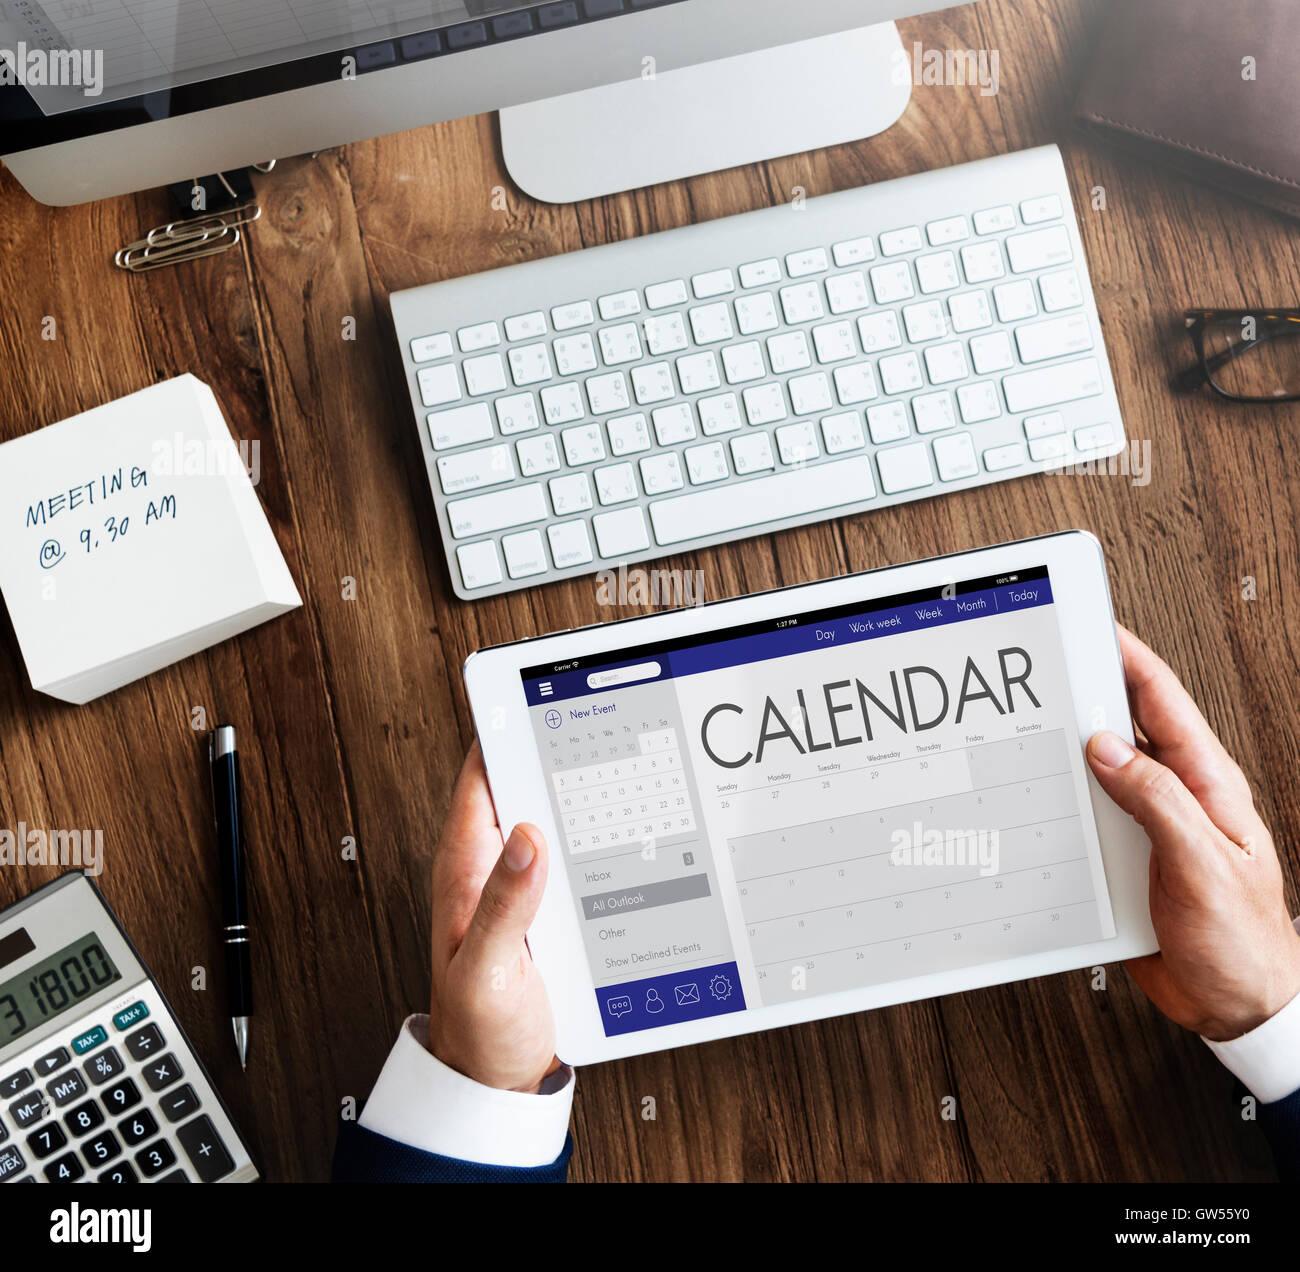 Calendar Date Organizer Planner Concept Stock Photo, Royalty Free ...